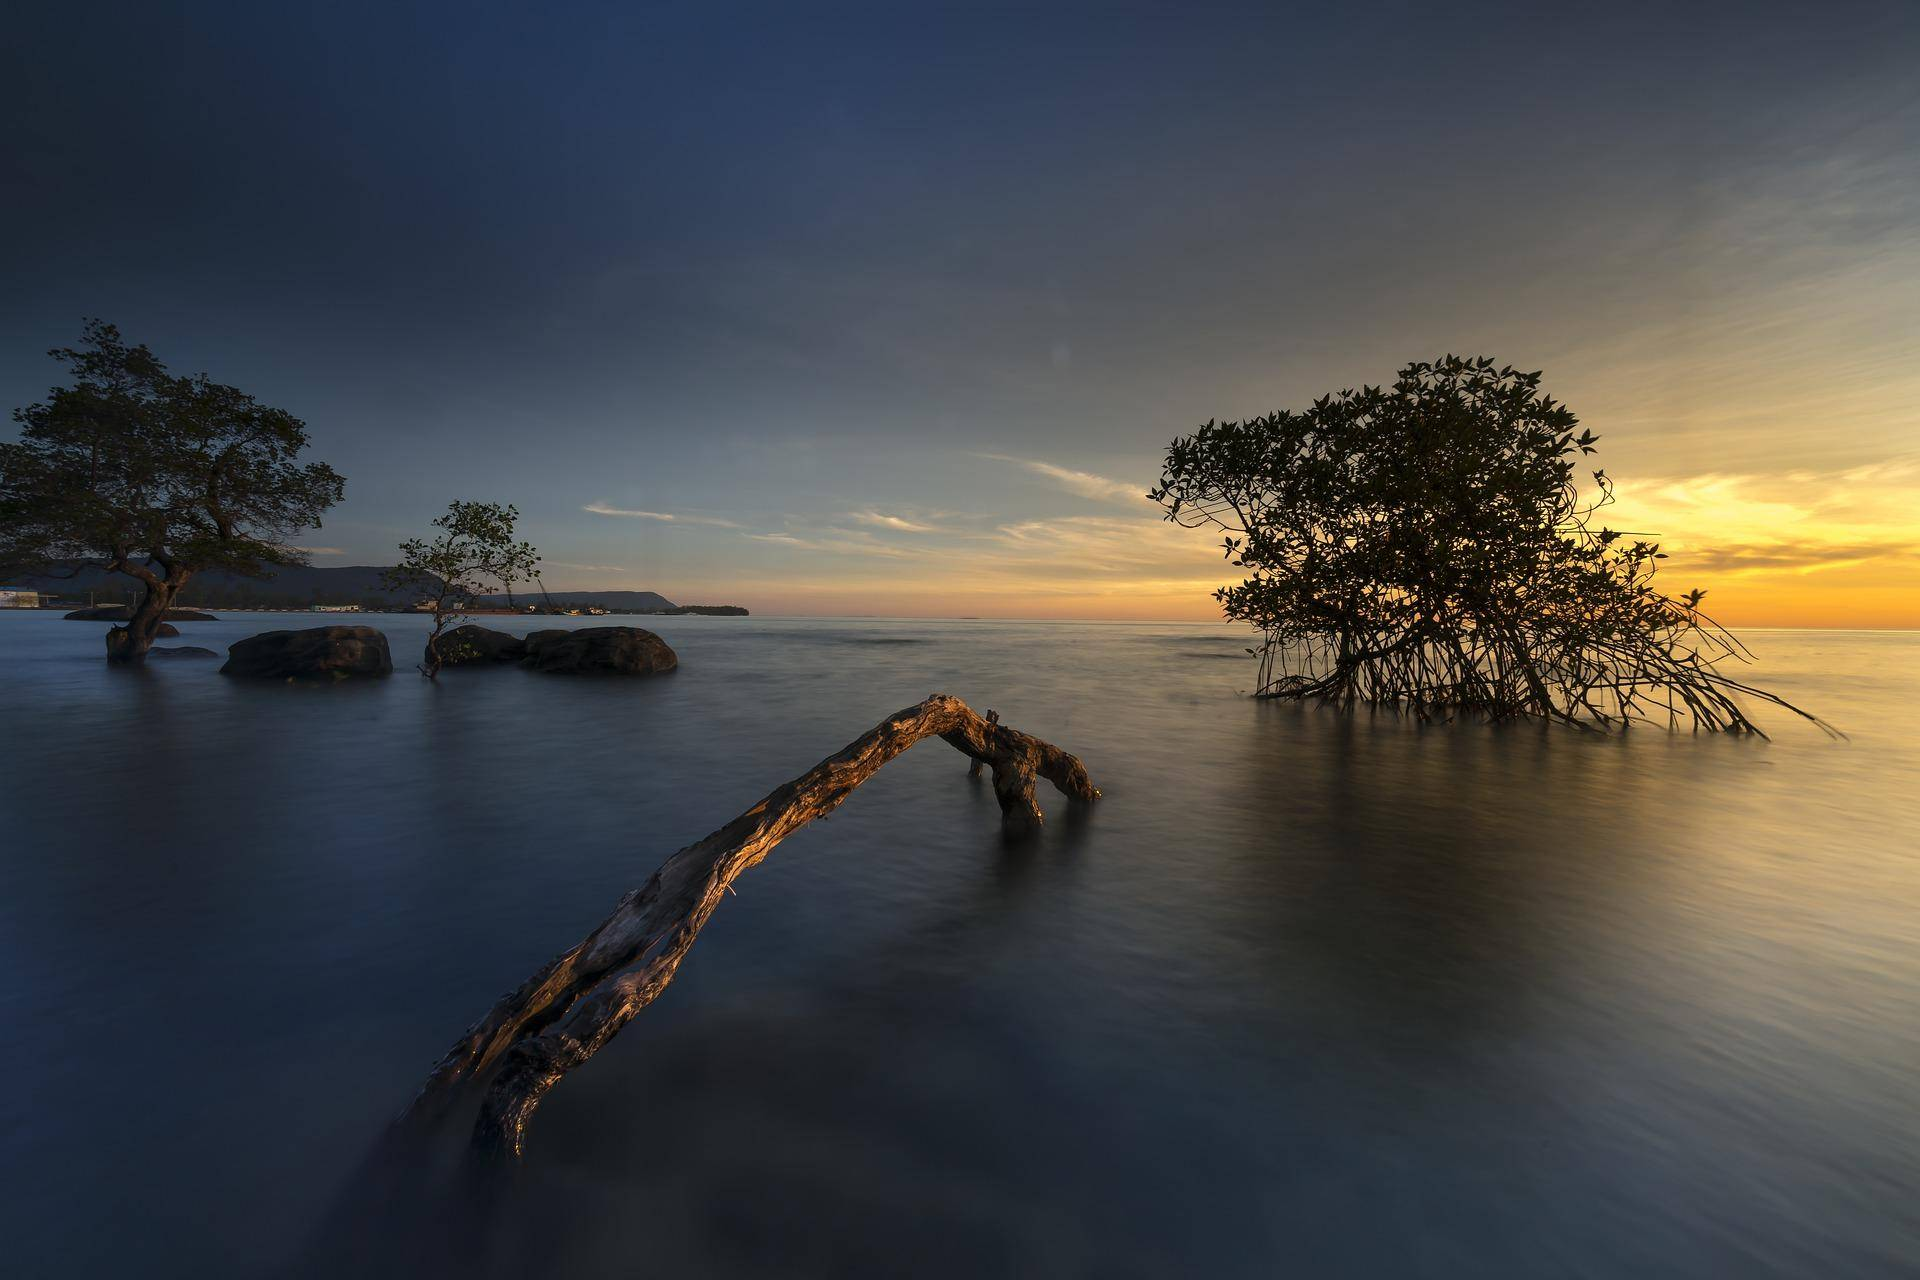 Mangroves in their natural coastal environment